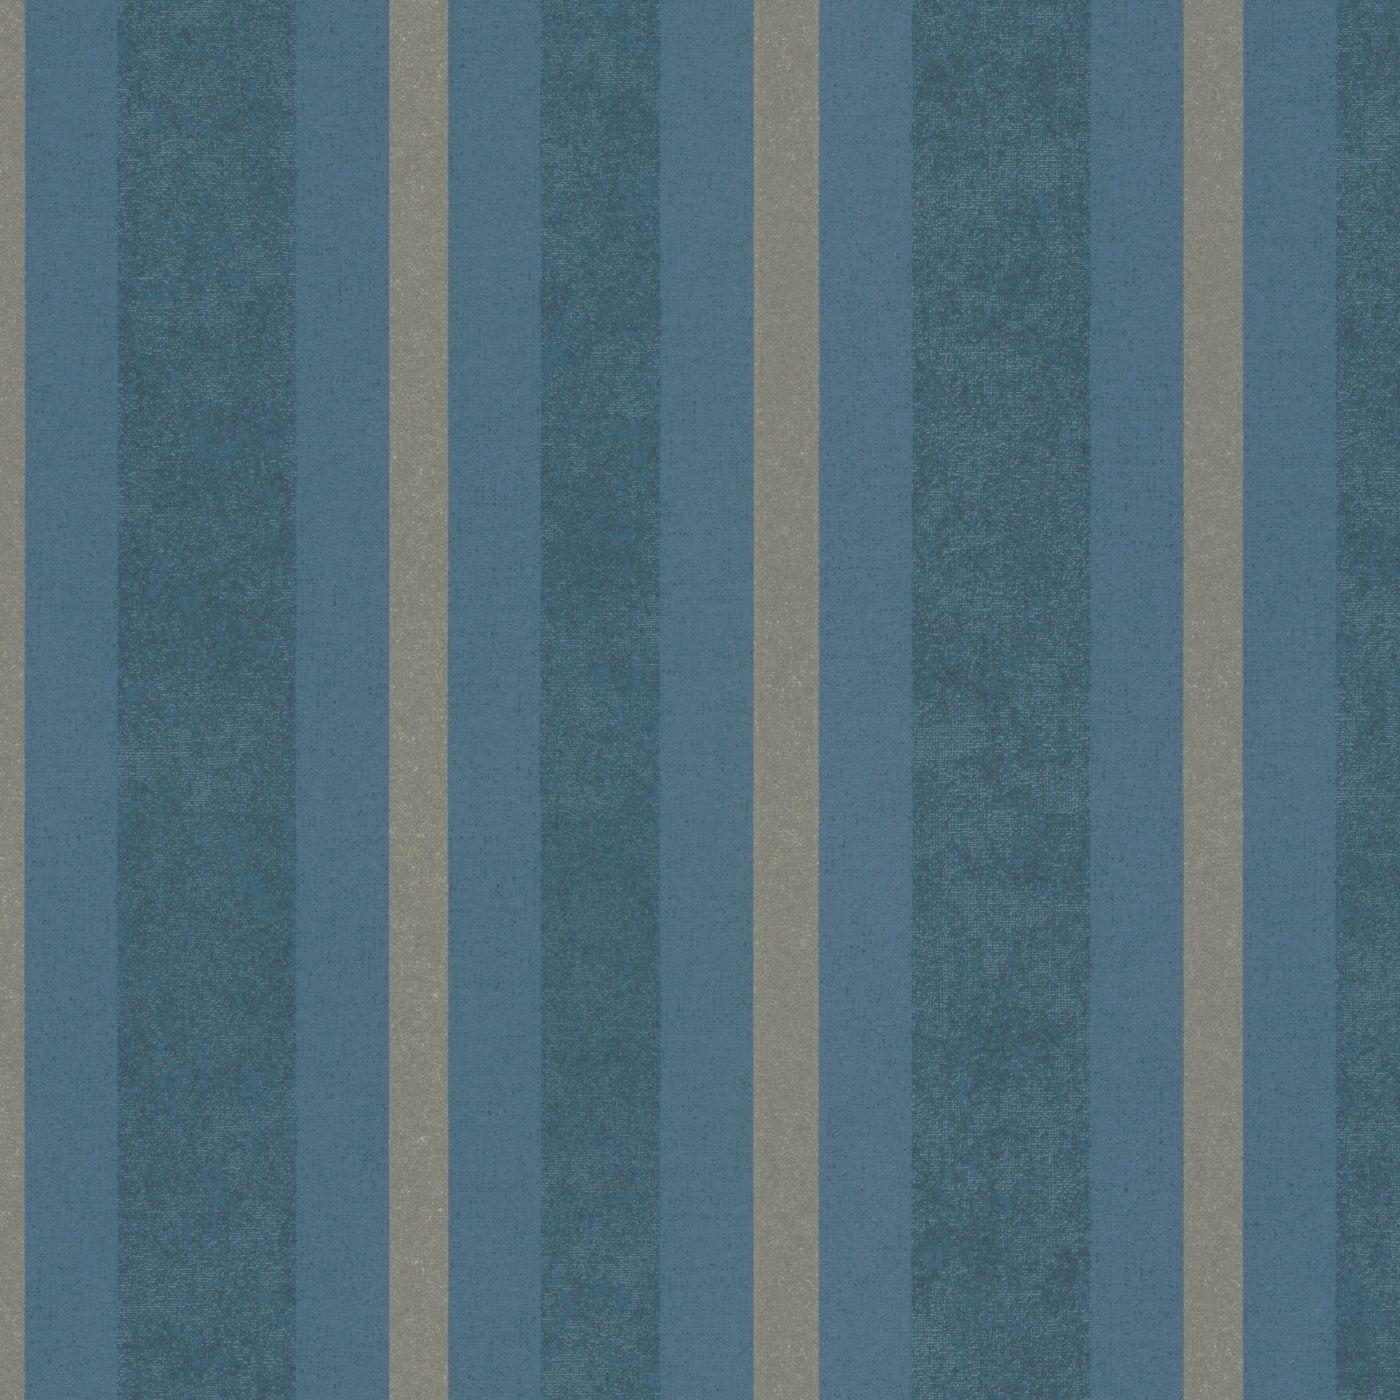 tapete vlies blau streifen padua marburg 56117 4 10 1qm ebay. Black Bedroom Furniture Sets. Home Design Ideas